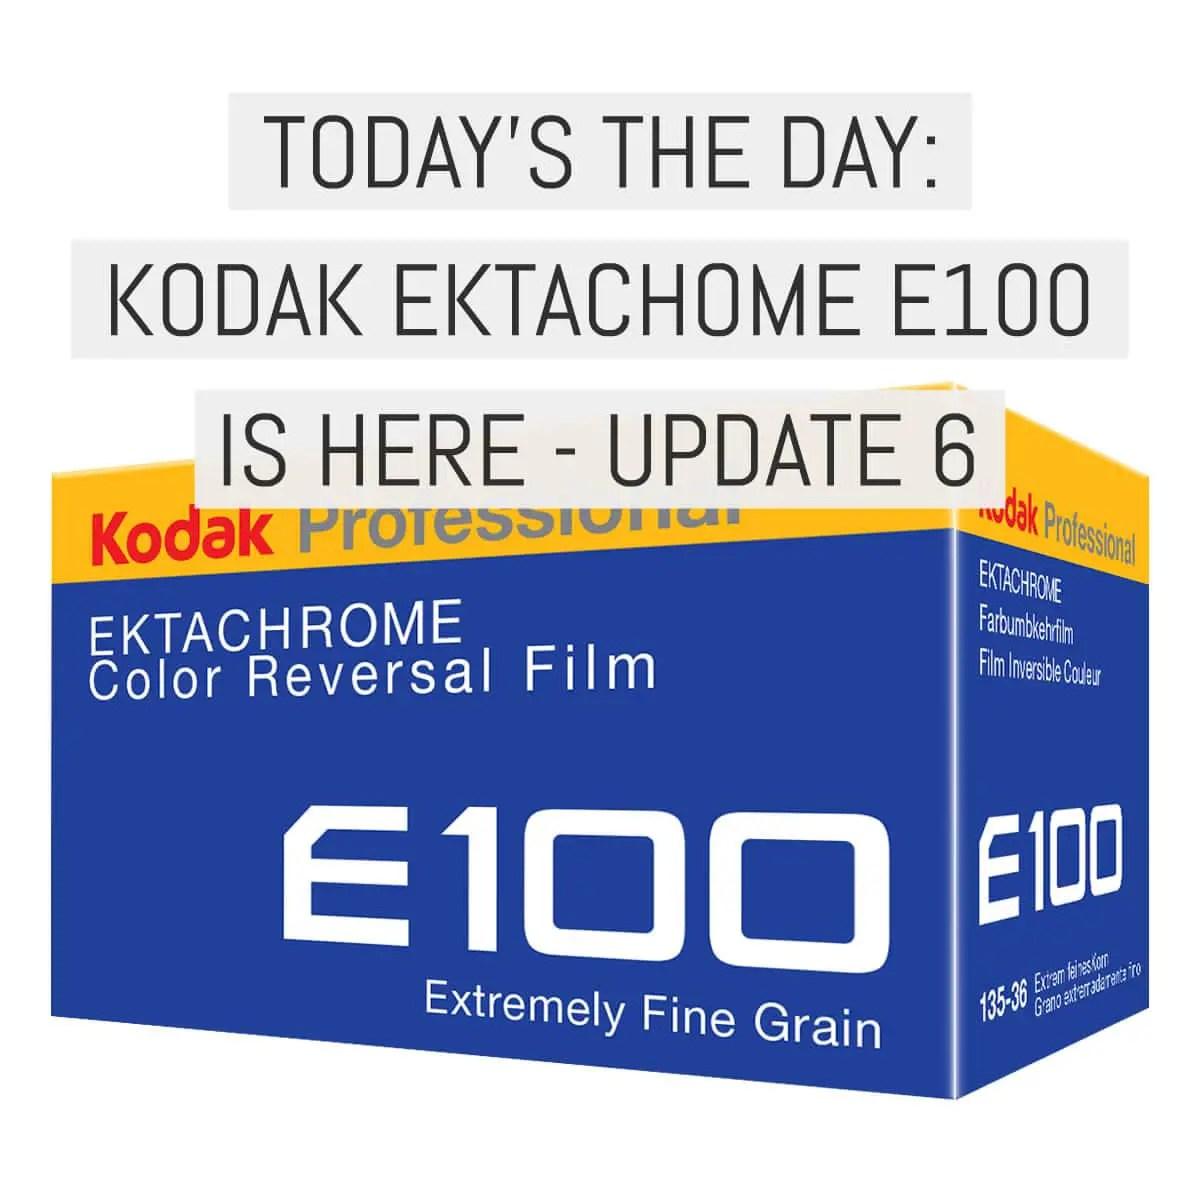 today s the day kodak ektachrome e100 release update 6 emulsive